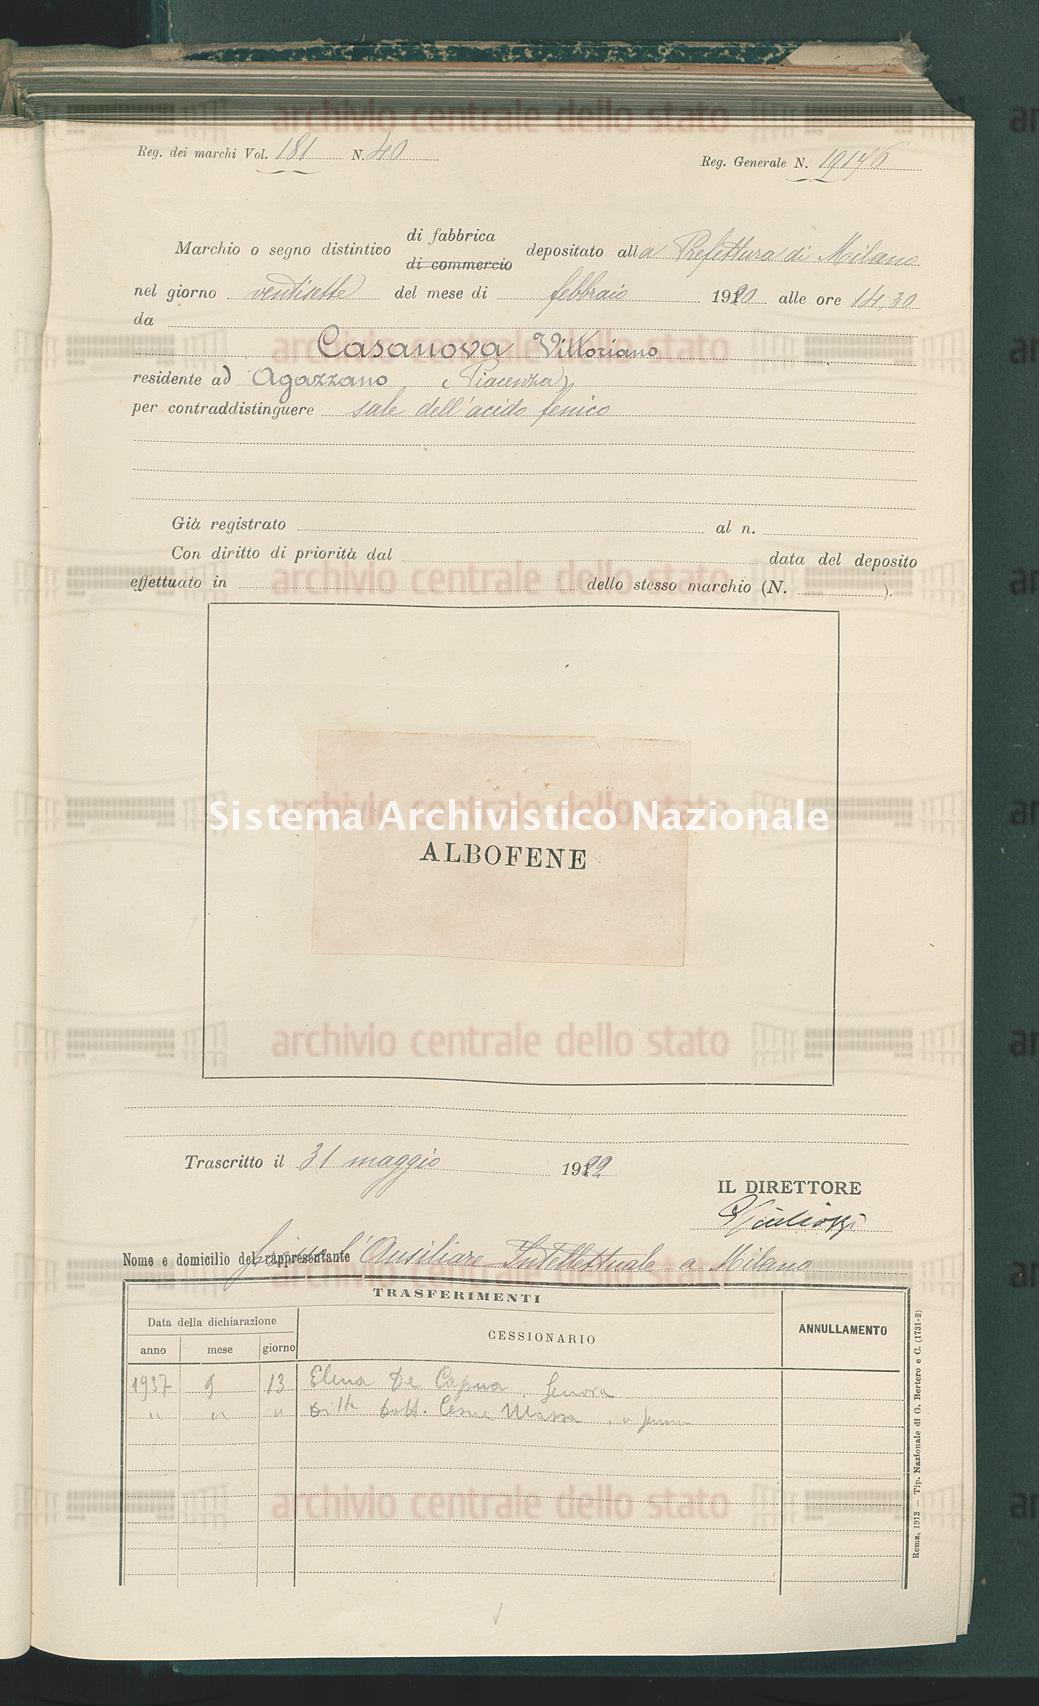 Casanova Vittoriano (31/05/1922)